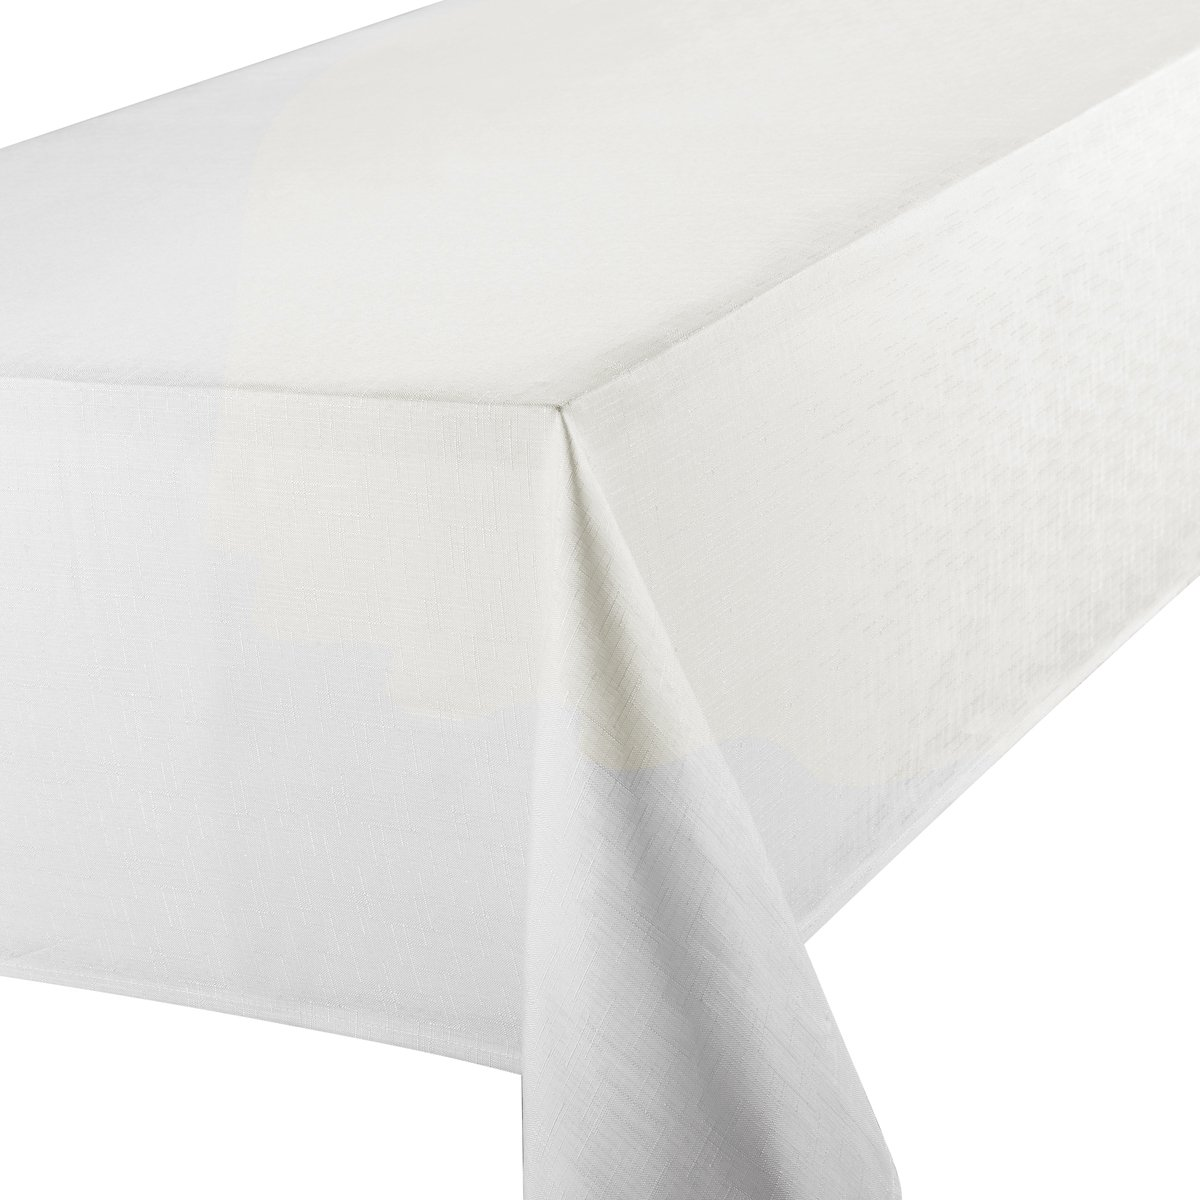 Premier 70 X 108 Inch Linen Look Oblong Tablecloth, White: Amazon.co.uk:  Kitchen U0026 Home